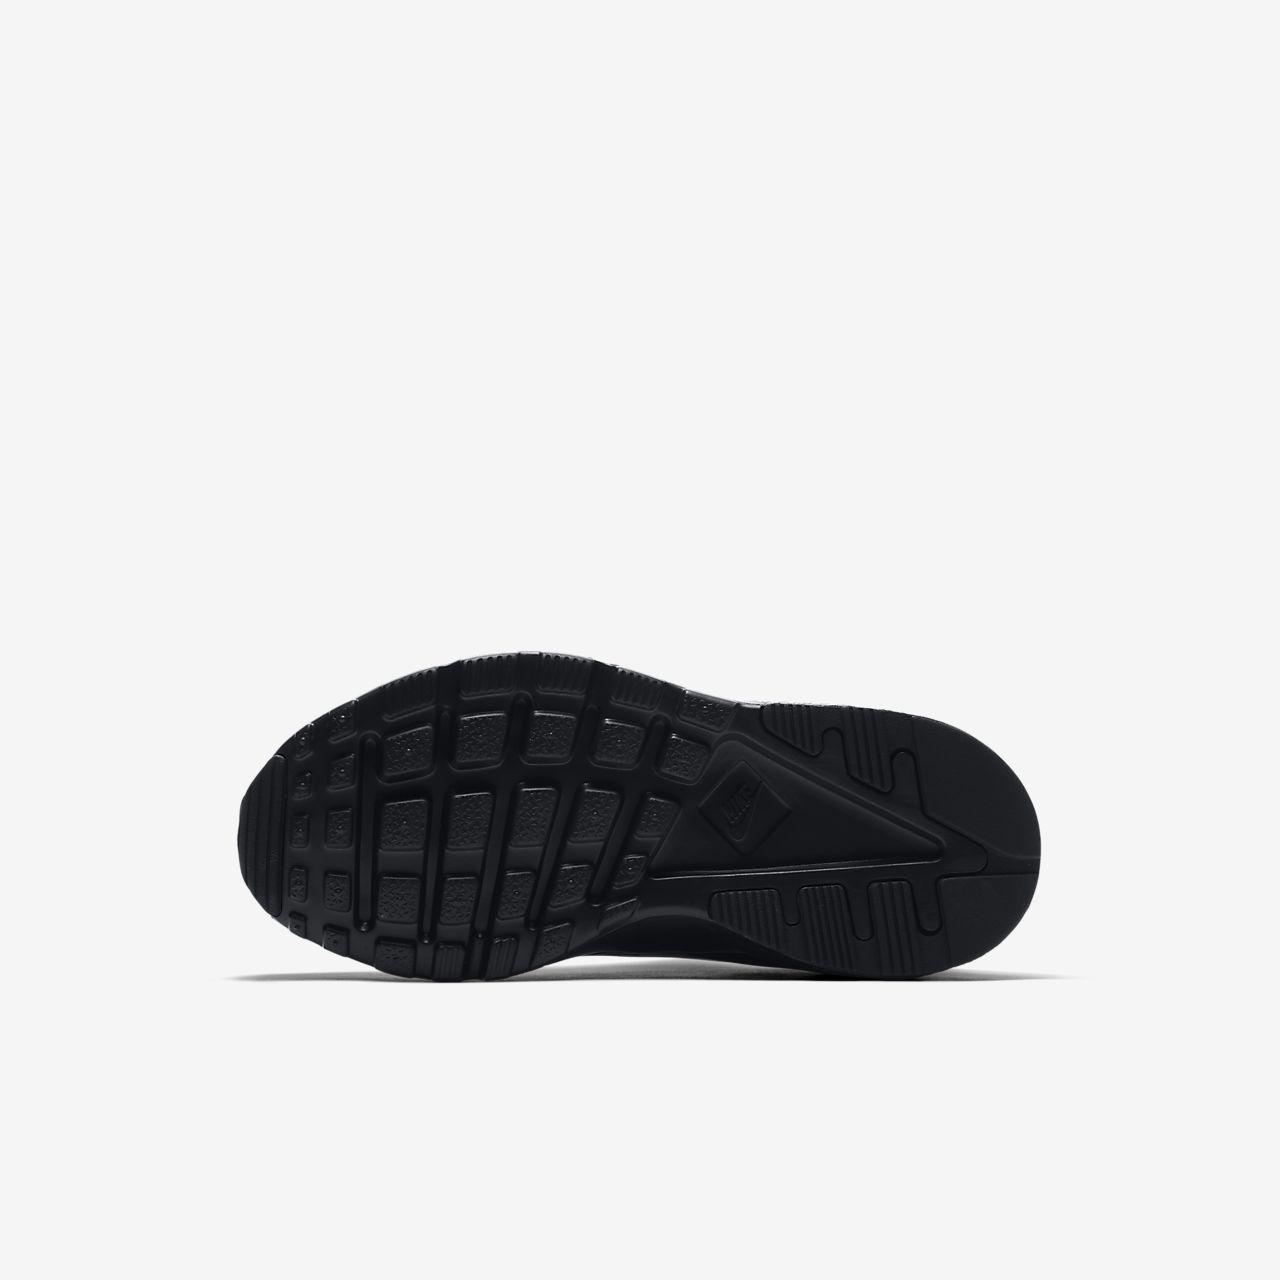 dbcc92f396 Nike Huarache Ultra Younger Kids' Shoe